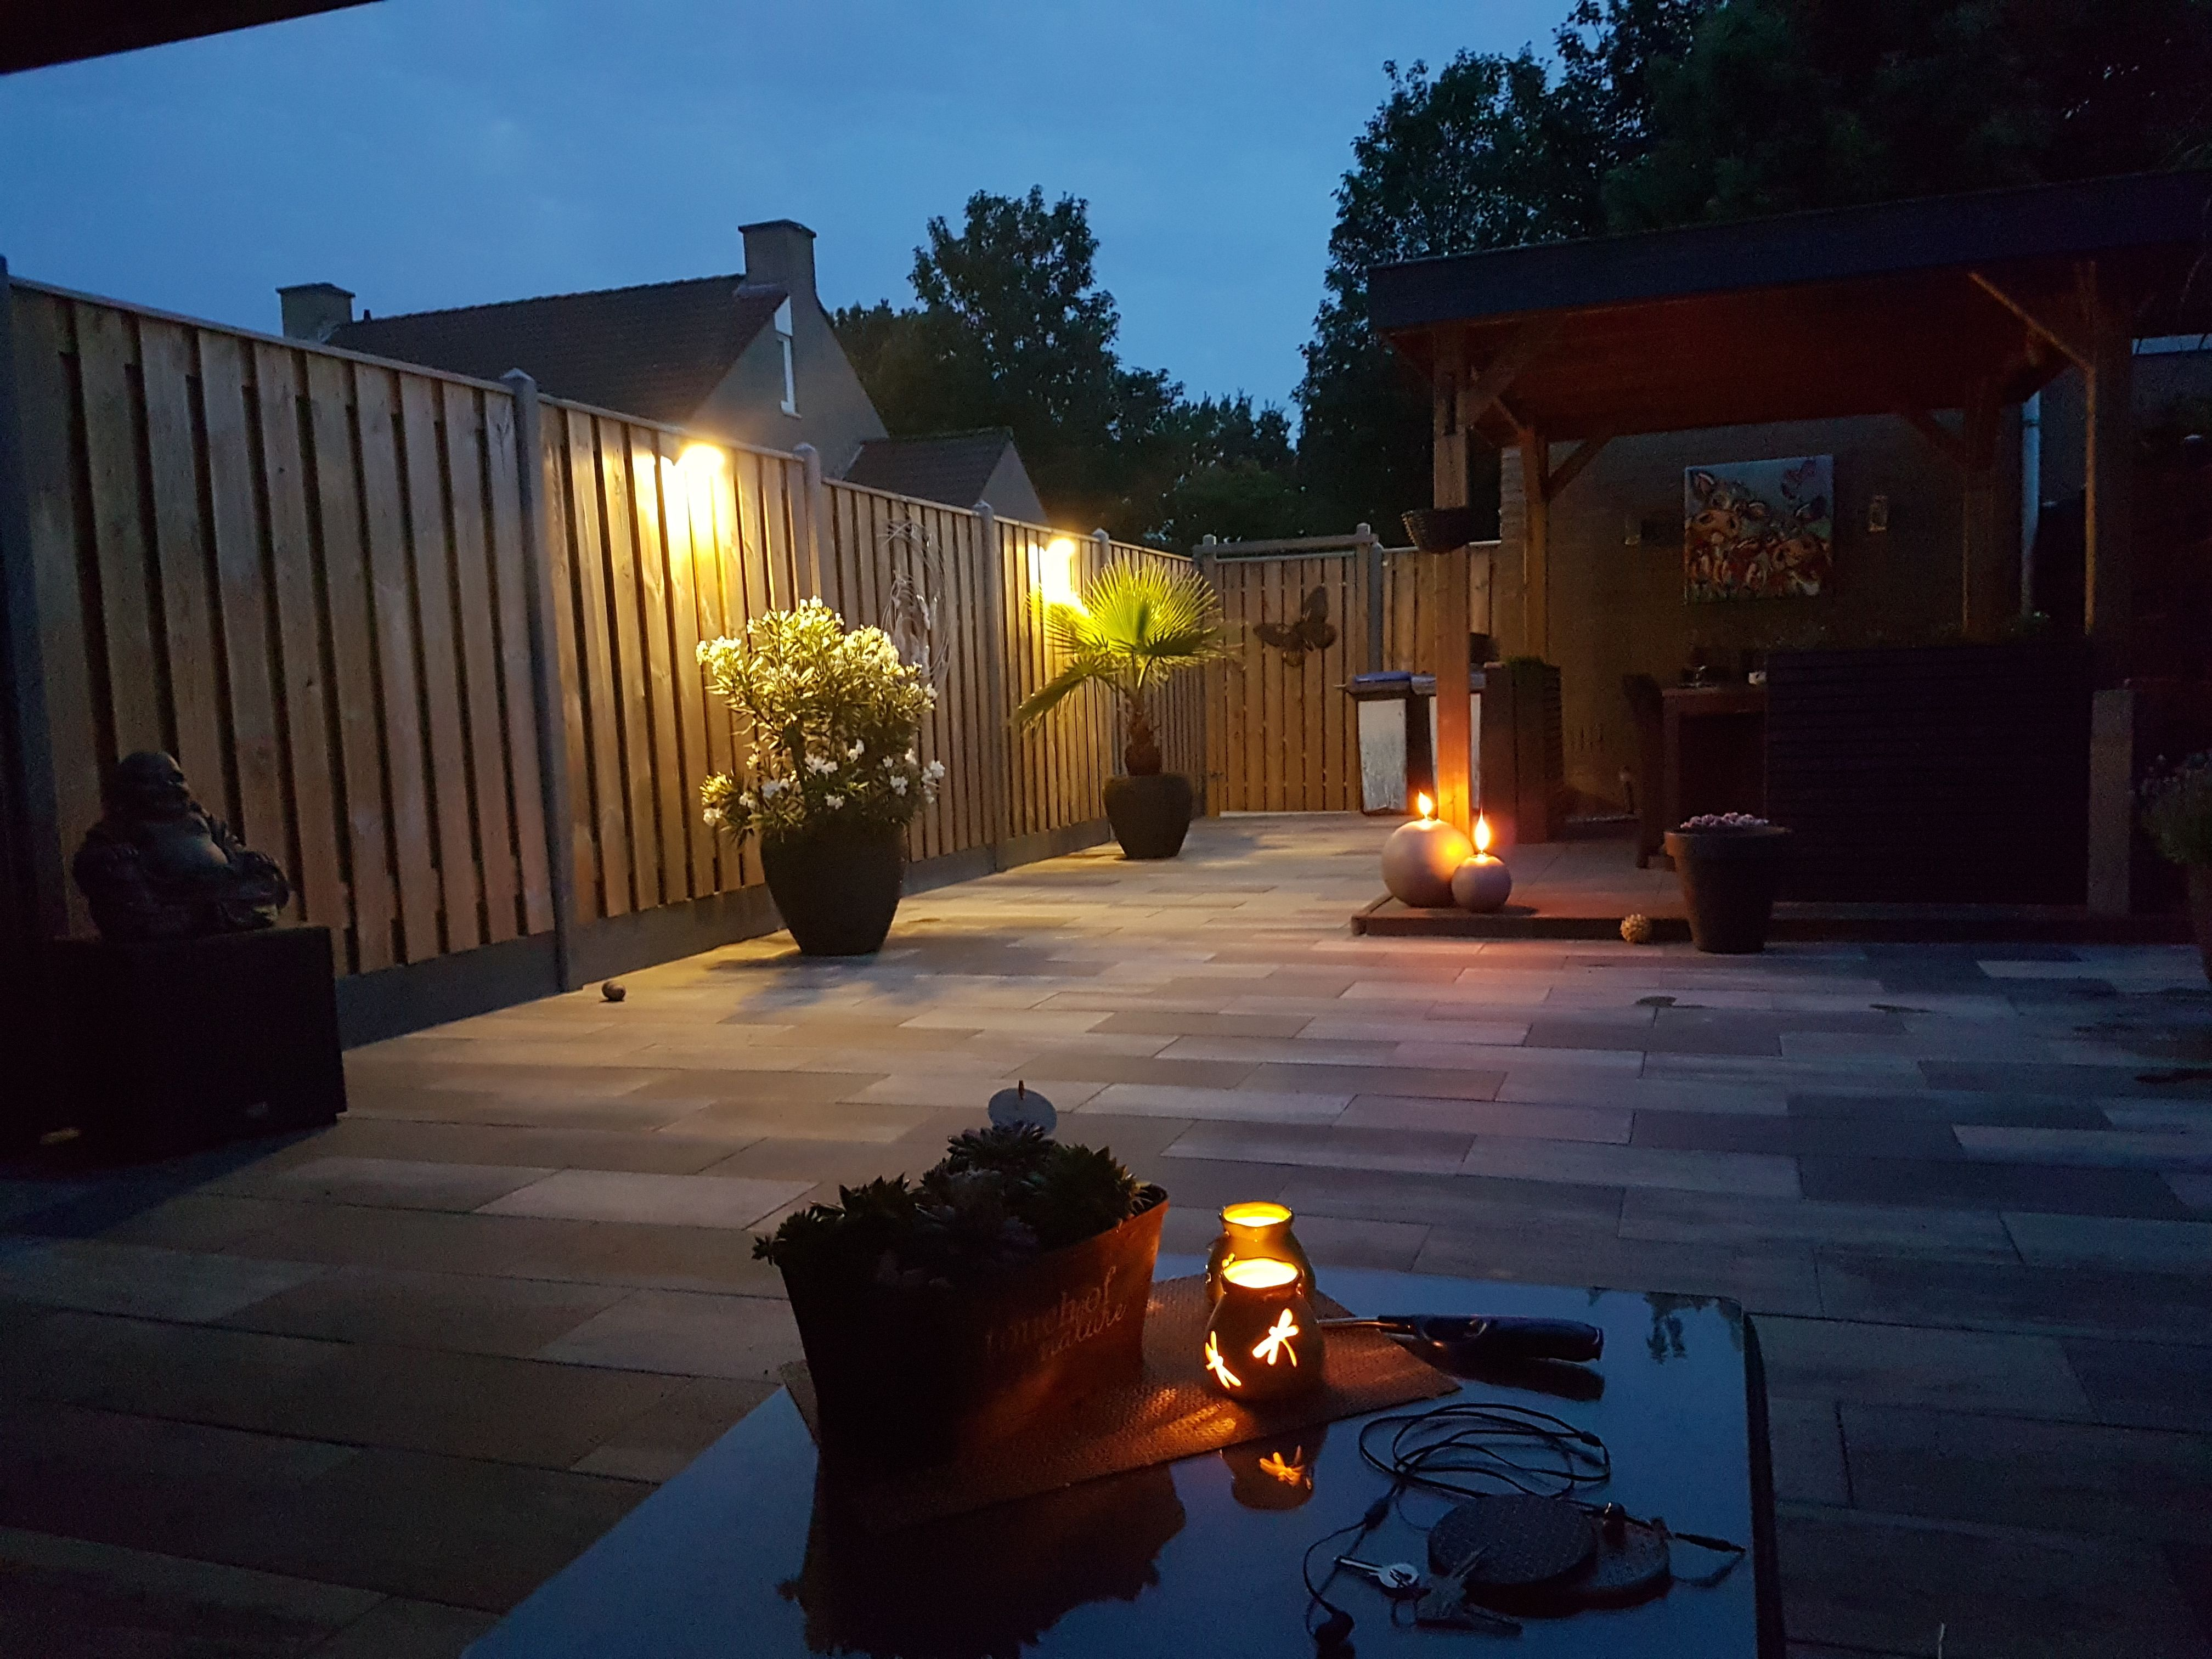 Solar Wandlamp Stuttgart Met 21 Leds En Bewegingsmelder Rvs Op Zonne Energie Solar Tuinverlichting Solar Wandlamp